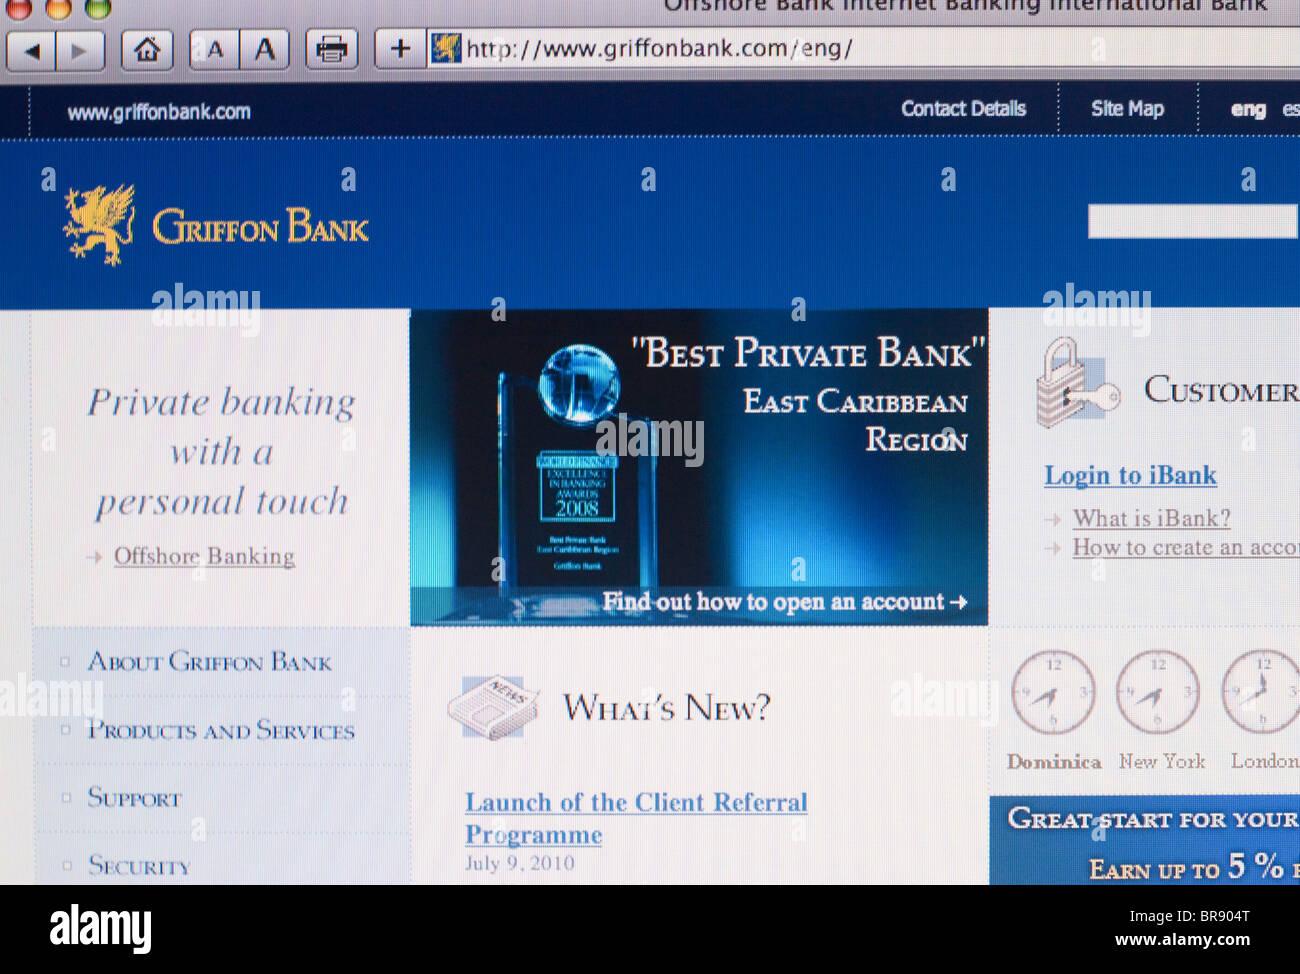 Griffon Bank Website Screenshot - Stock Image